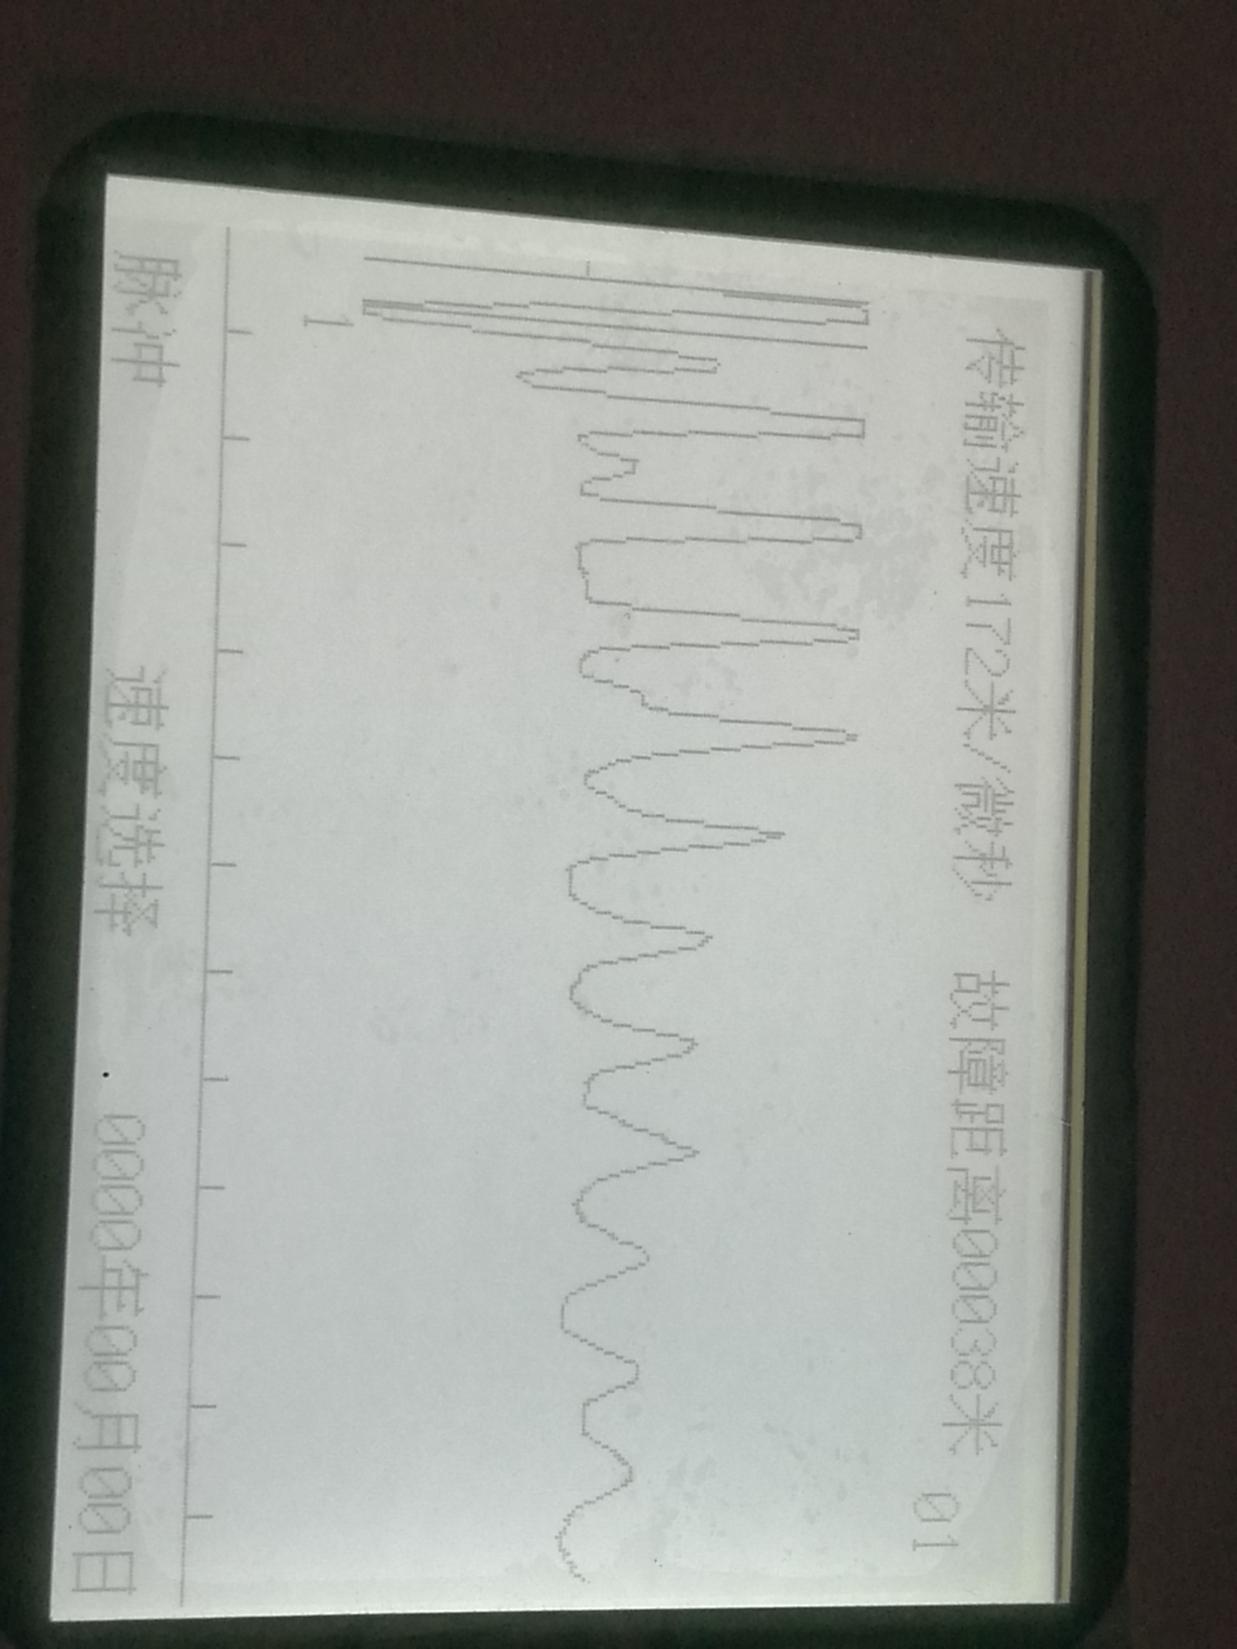 <b>电缆故障产生的机理概述与测距正规演示,这一把干货价值百万</b>